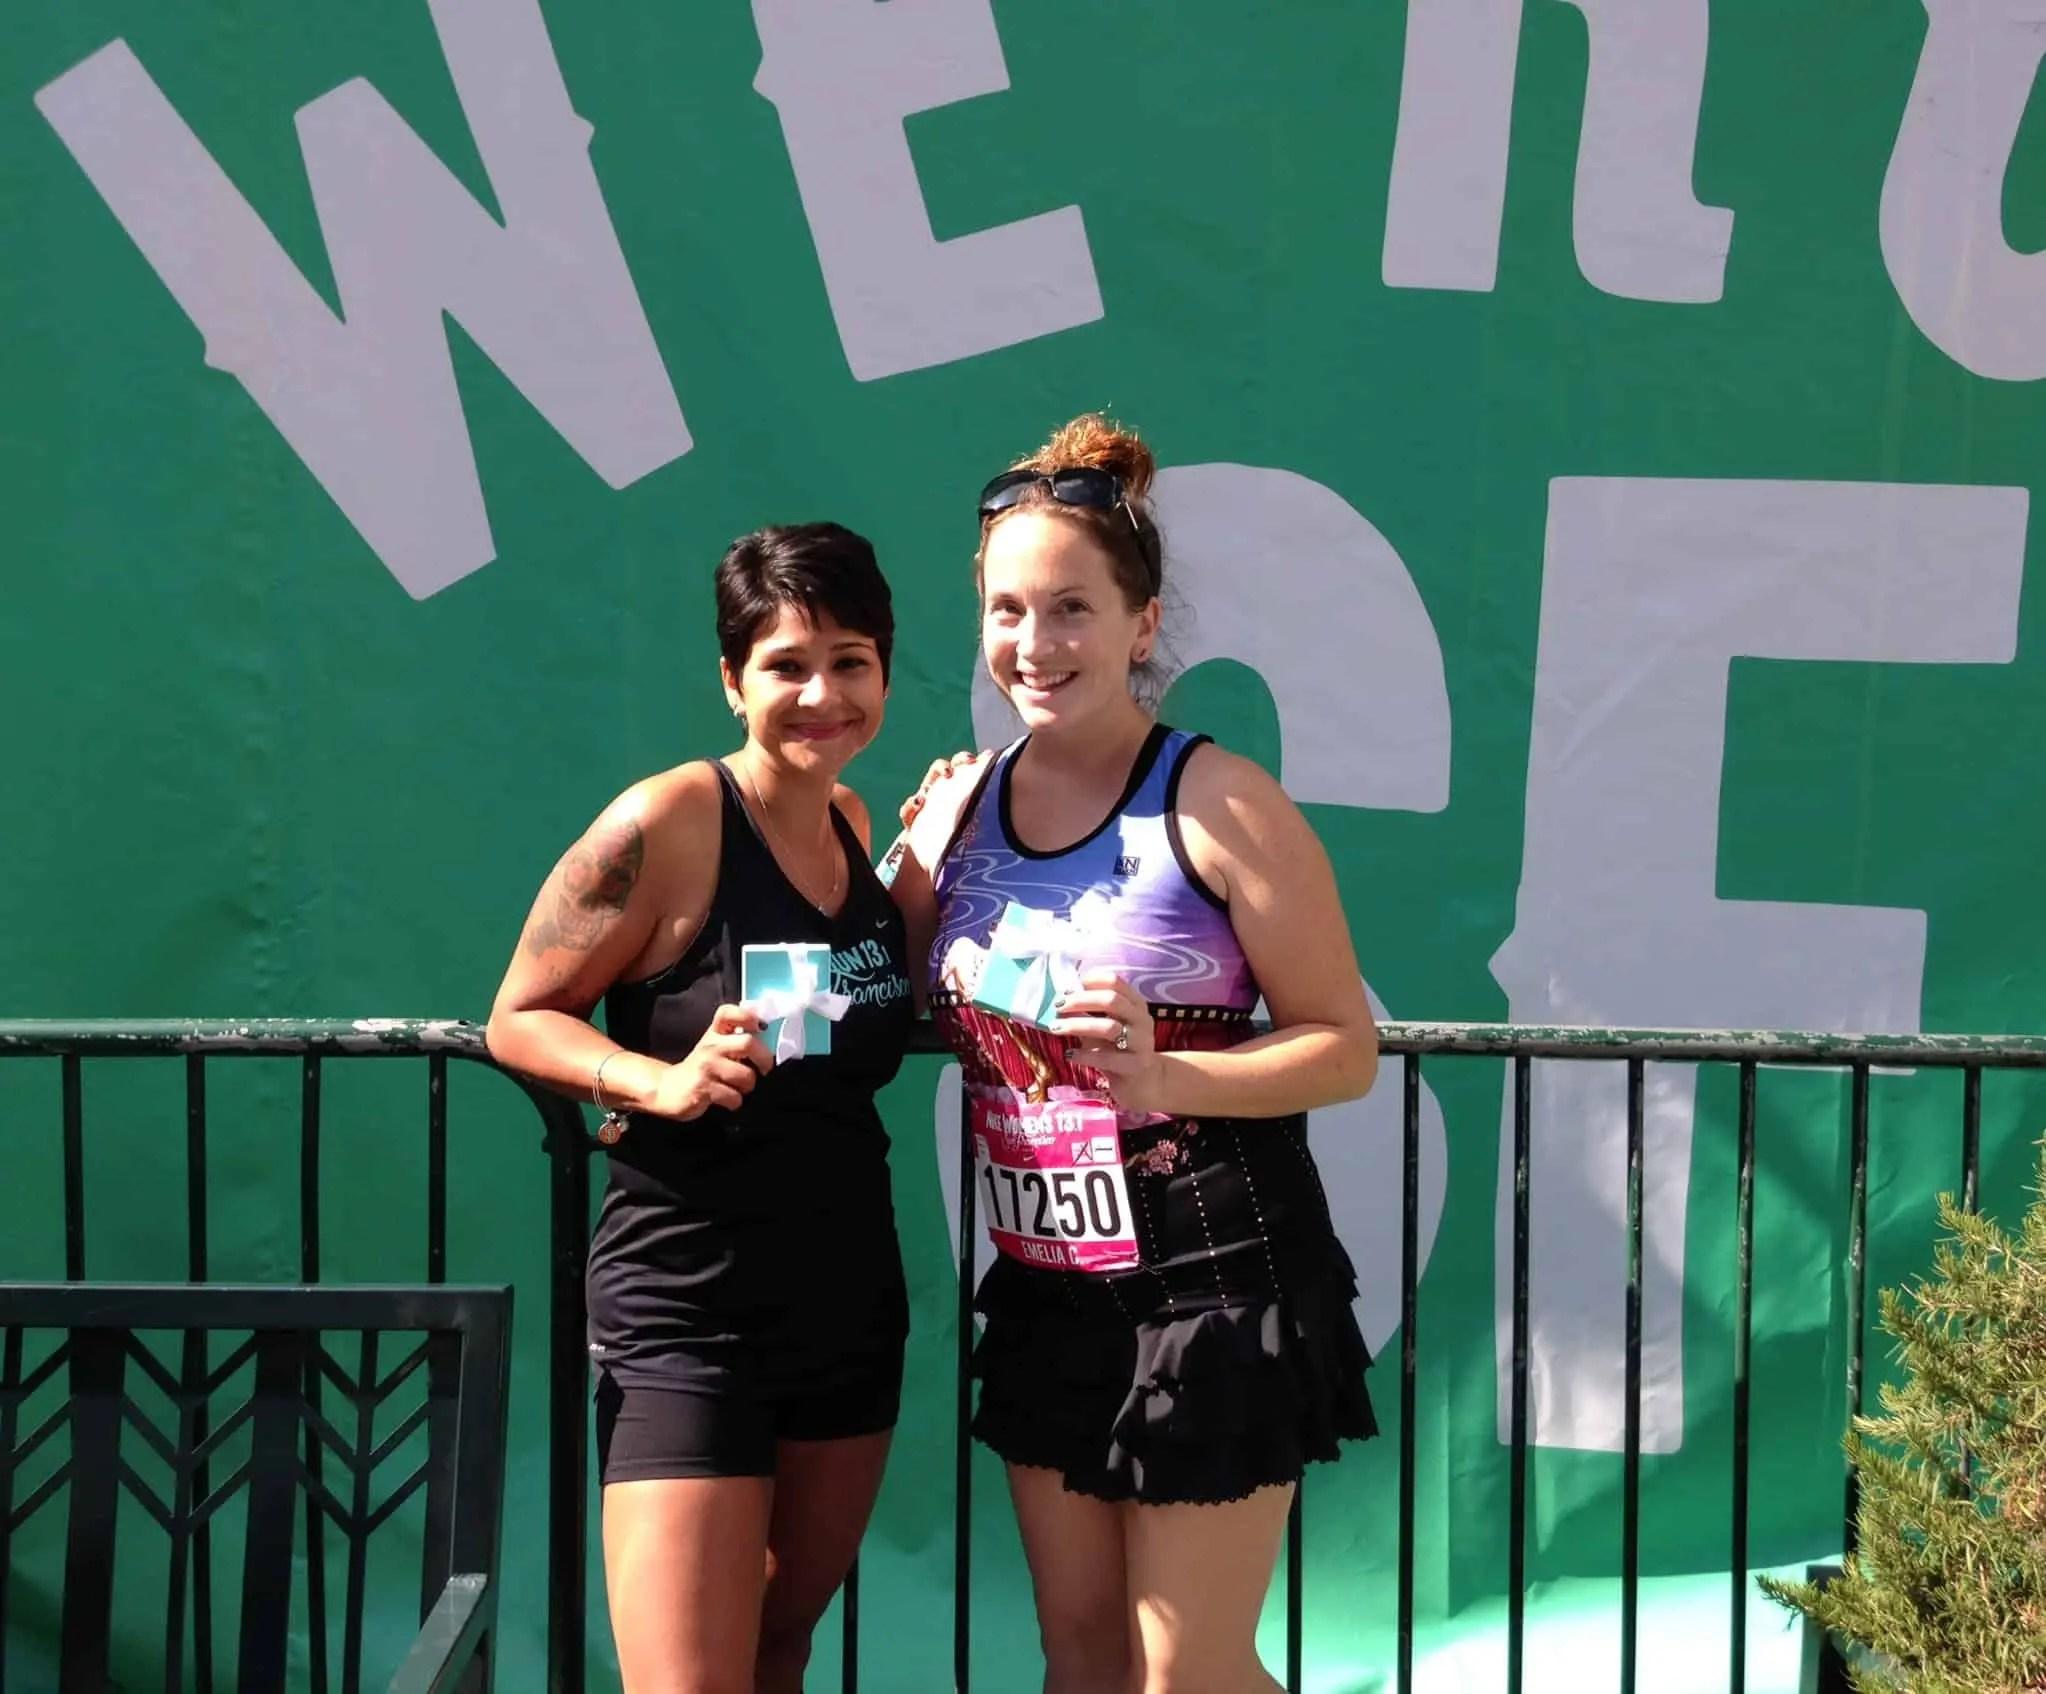 6aea24026 My Nike Women's Half Marathon San Francisco Experience • Half Crazy Mama